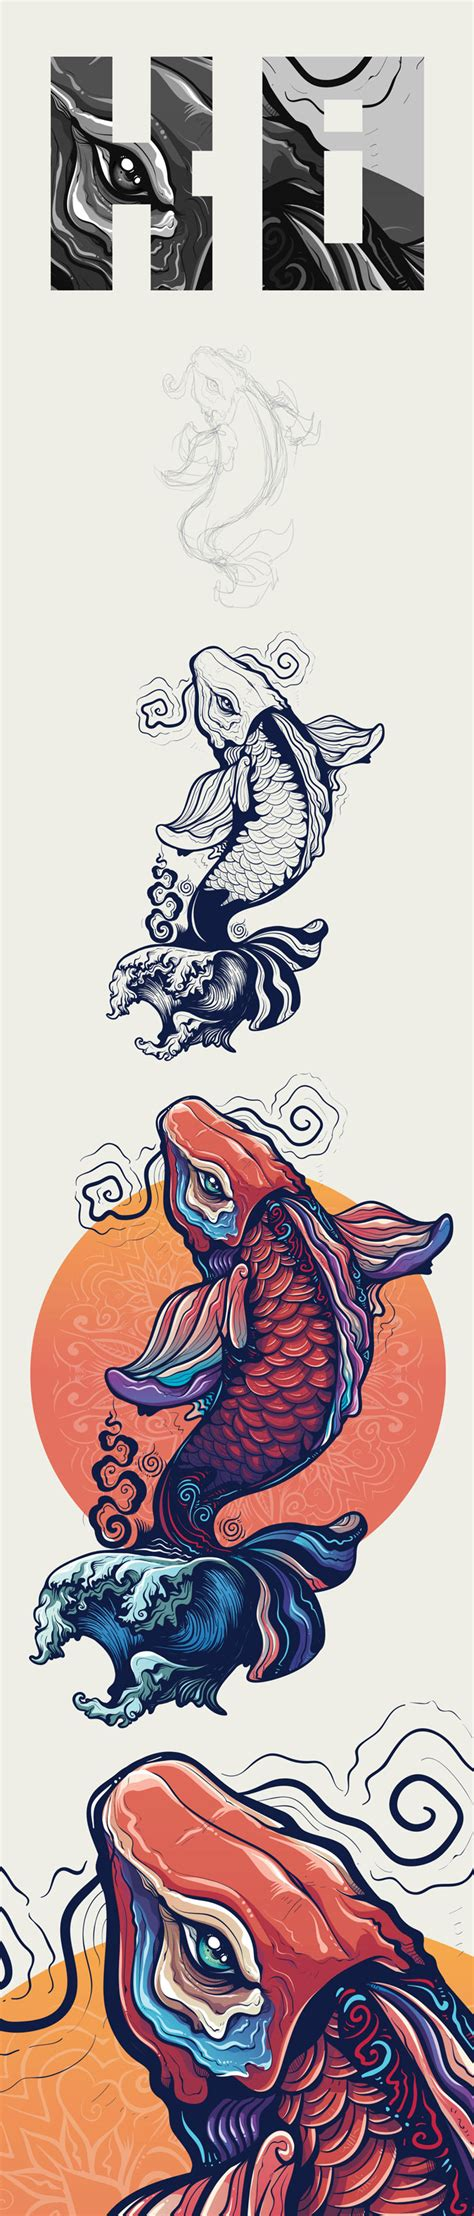 illustrator pattern exles 42 creative illustration design exles